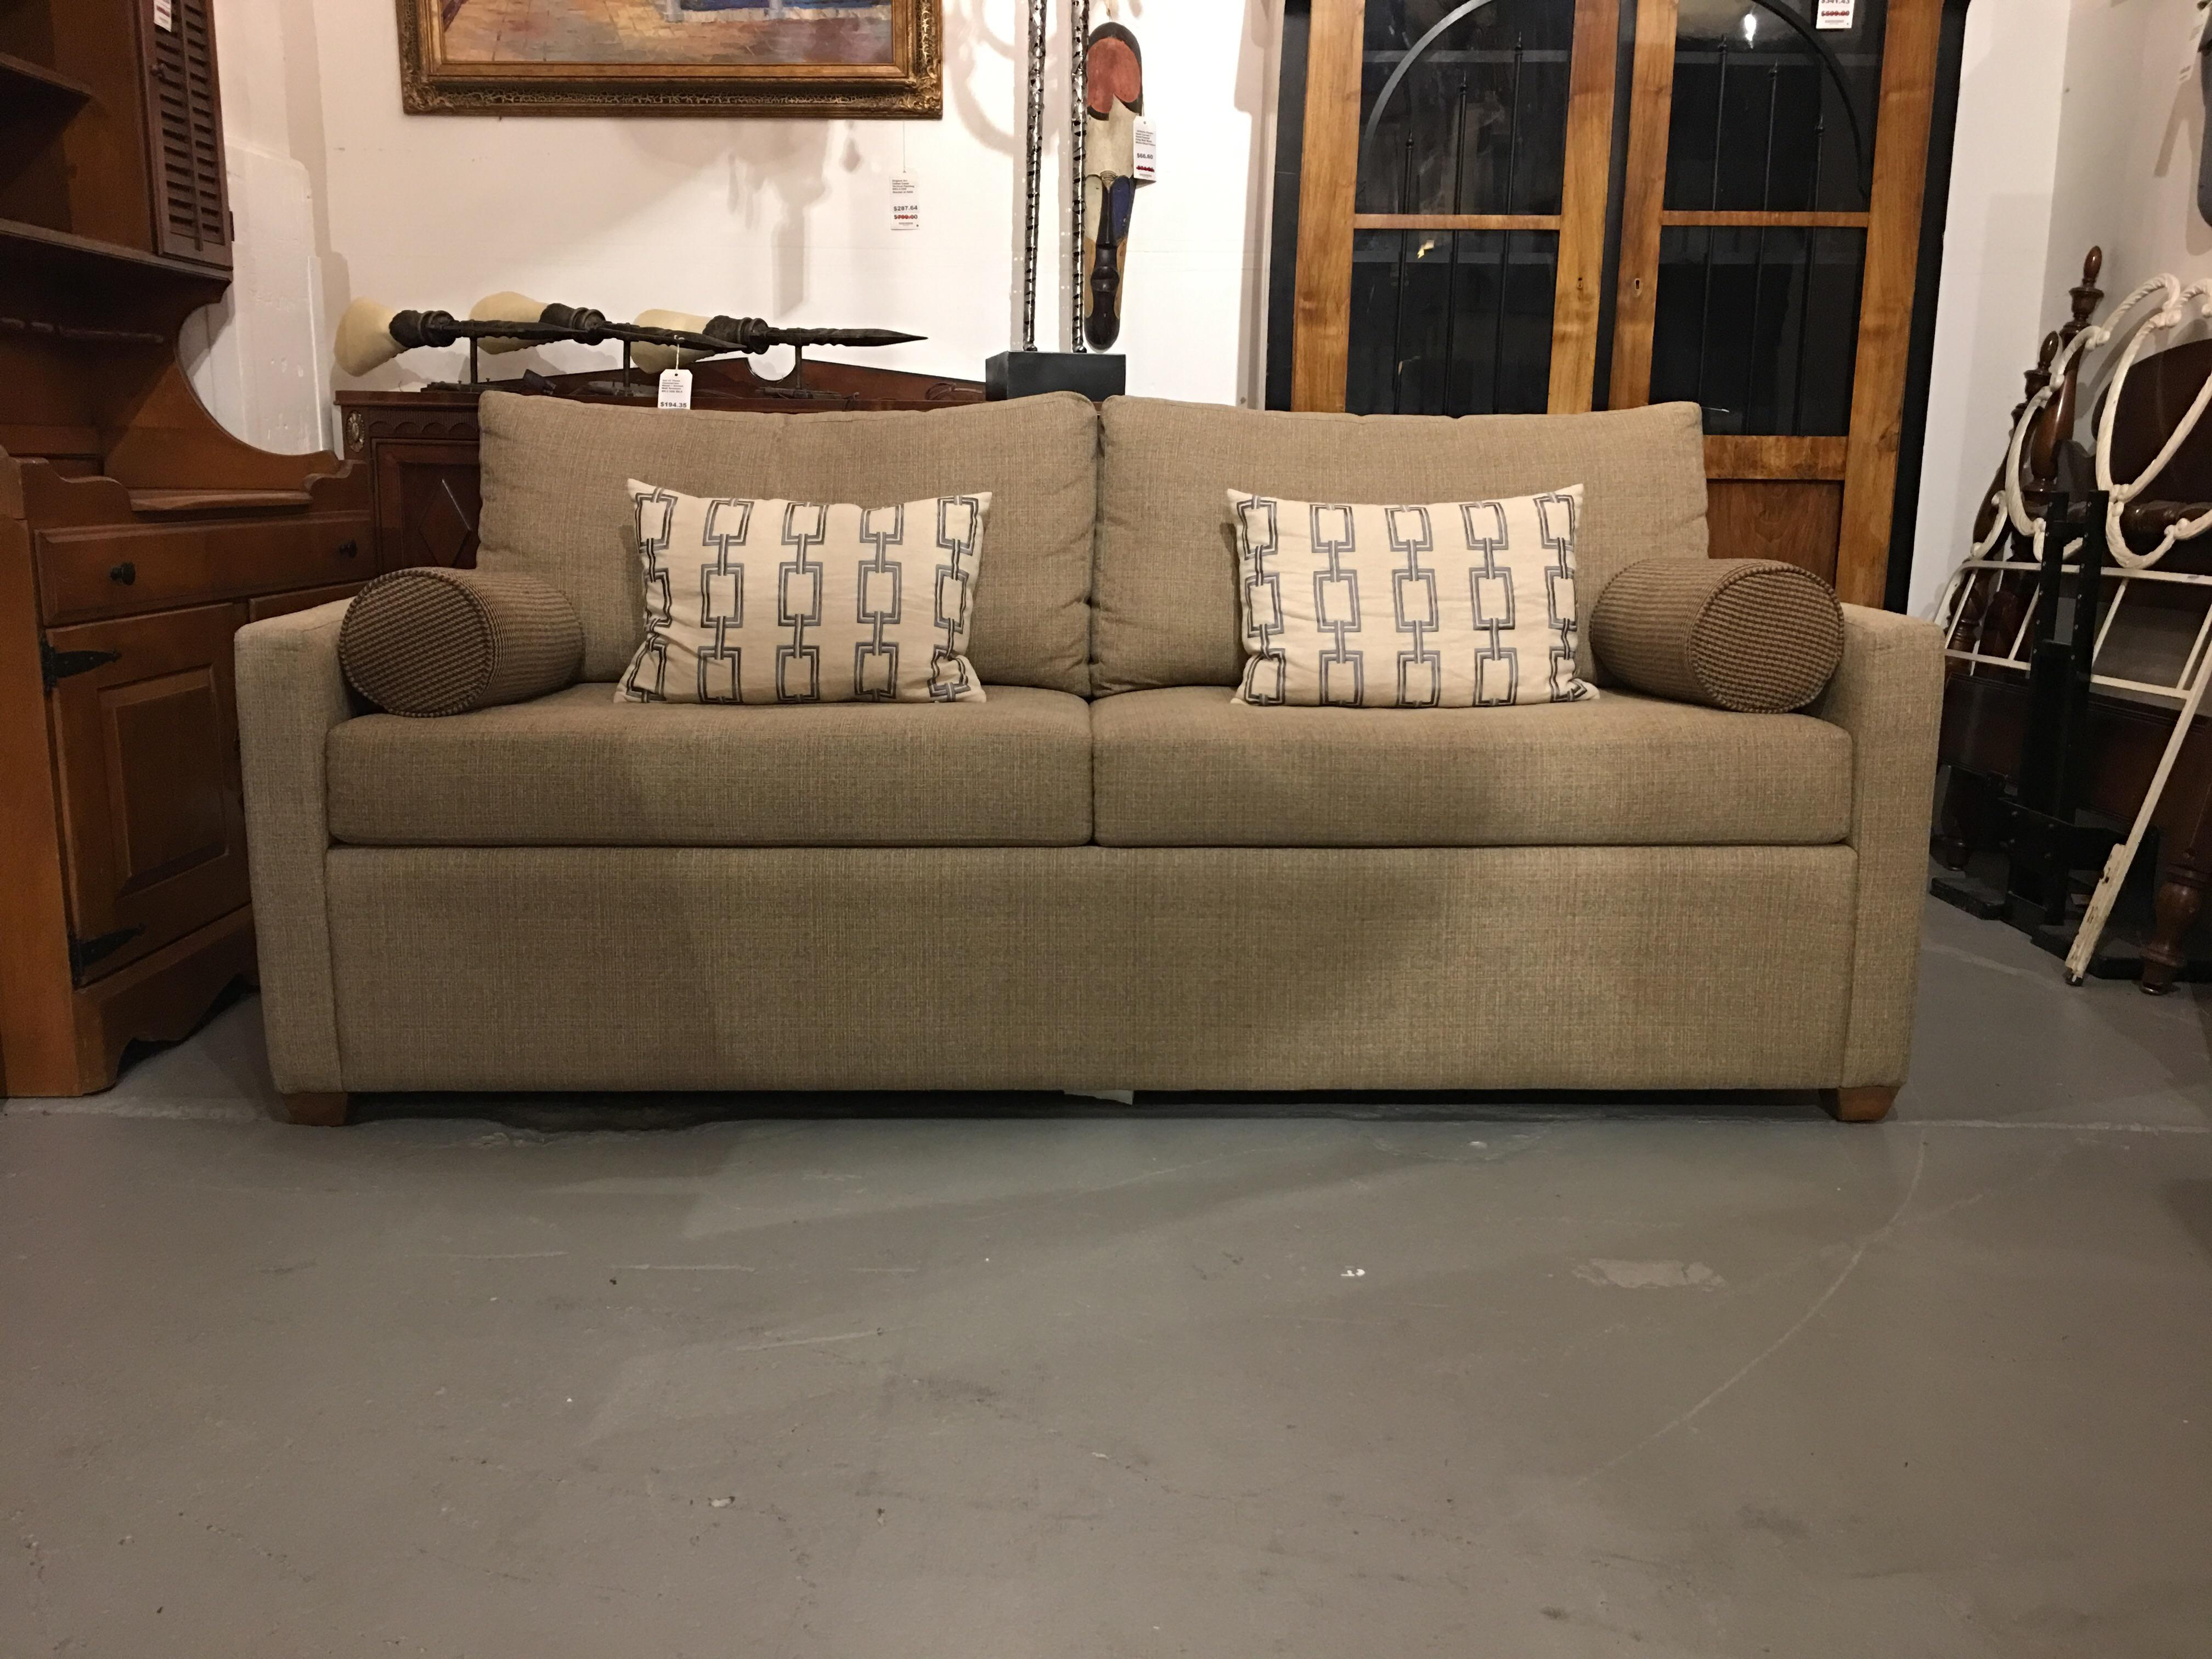 Queen Size Convertible Sofa Bed Queen Size Convertible ...